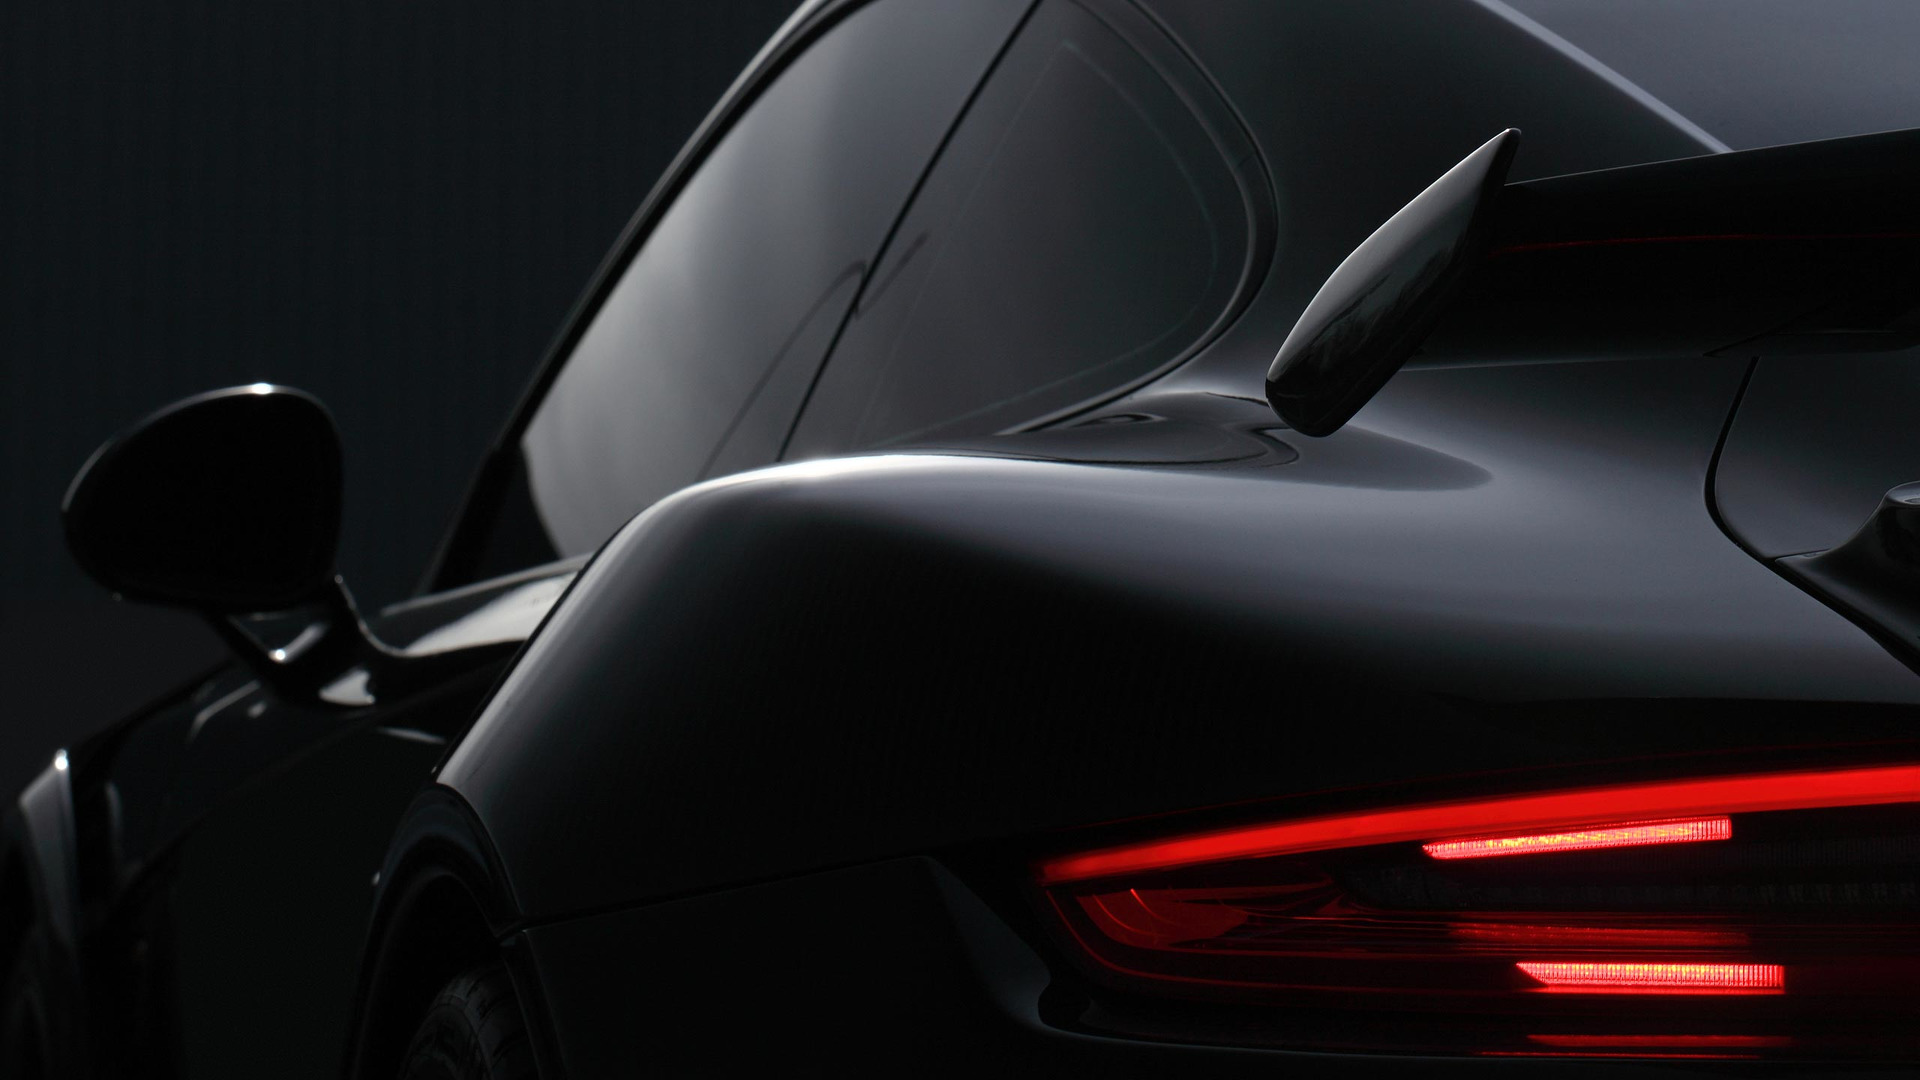 Carbon Porsche 911 Turbo Topcar (20)